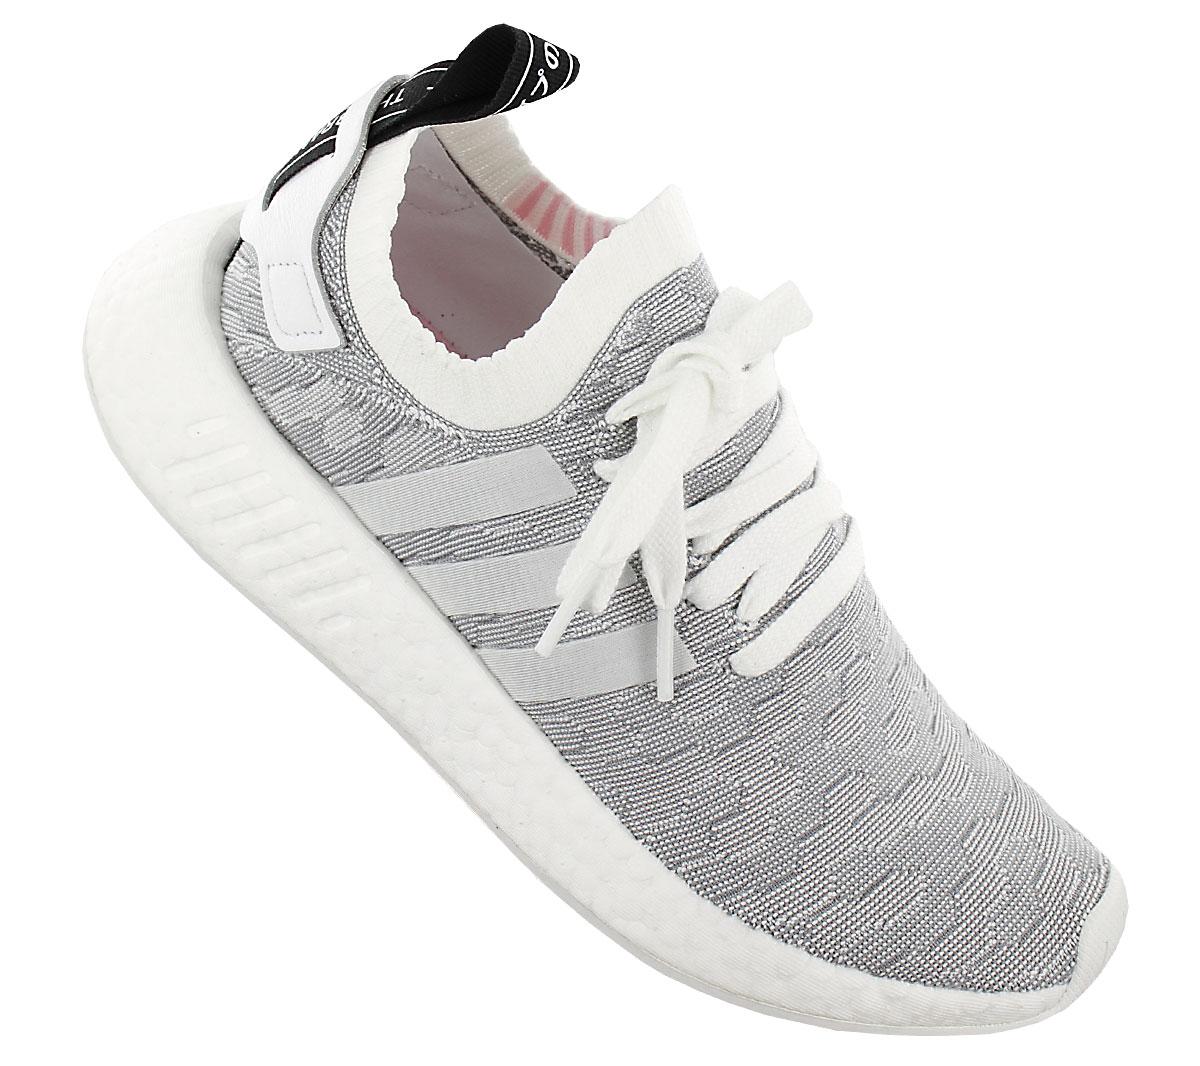 Details zu adidas Originals NMD R2 PK W Primeknit Damen Sneaker Schuhe Turnschuhe R1 BY9520